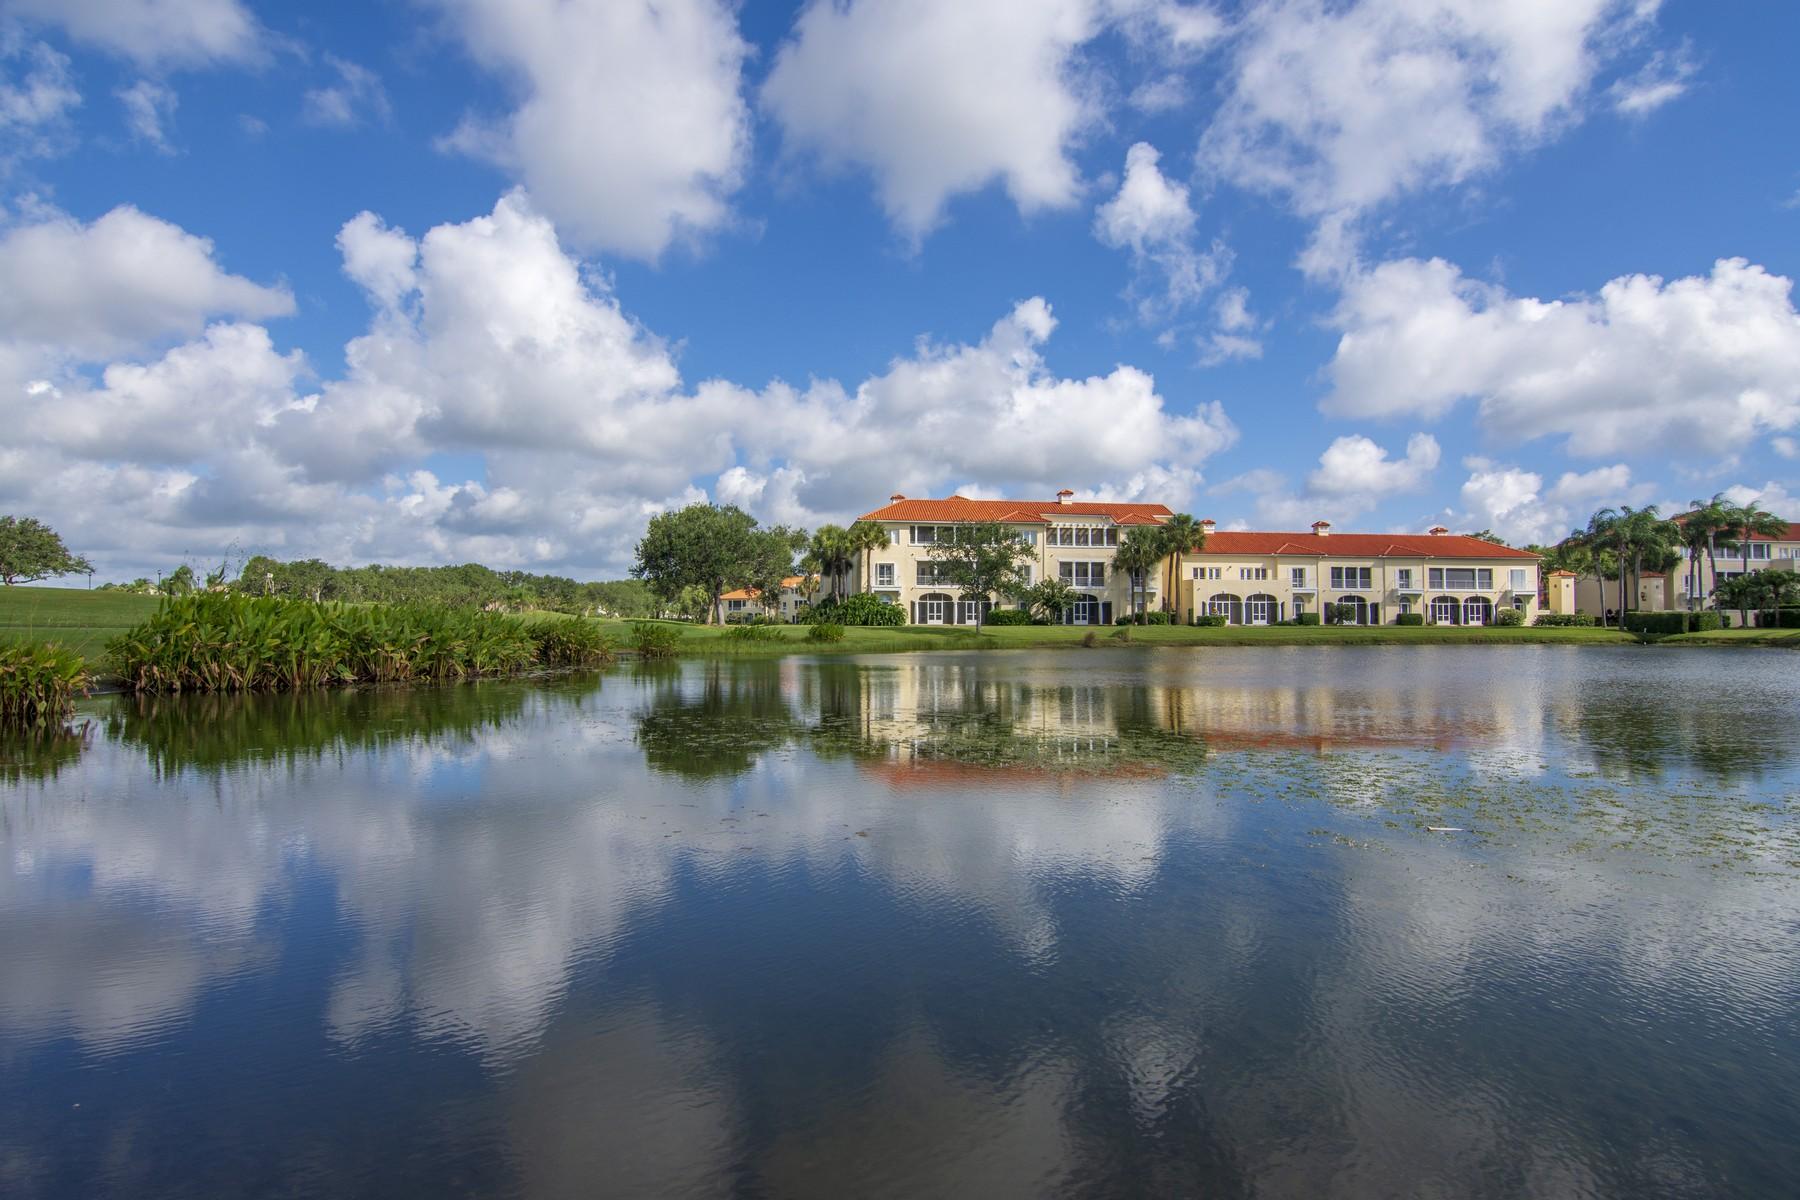 Property for Sale at Golfer's Dream Condo 5065 Harmony Circle Unit 206 Vero Beach, Florida 32967 United States